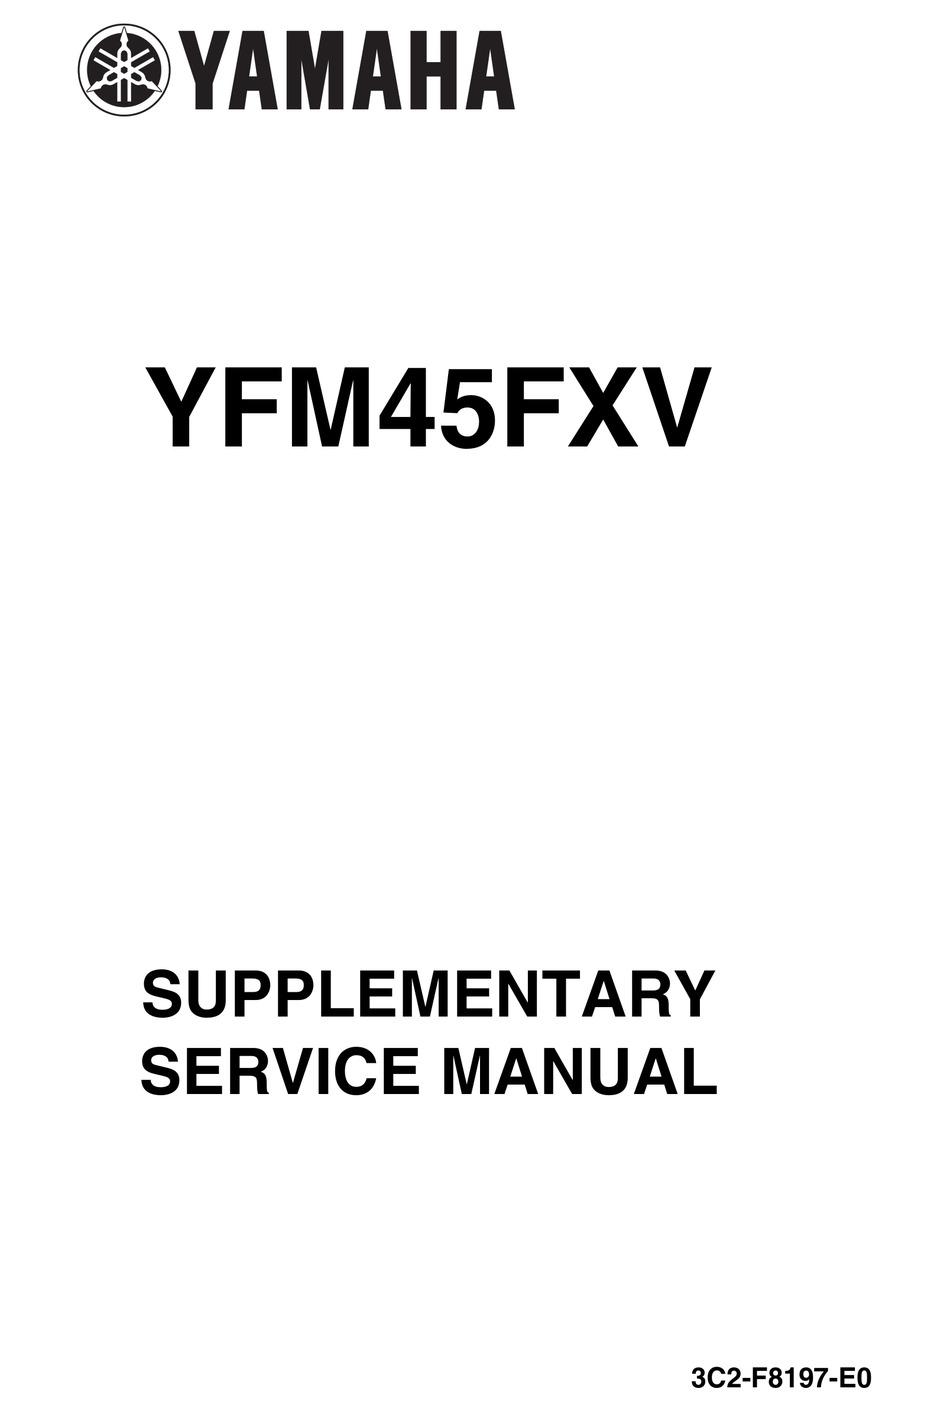 YAMAHA YFM45FXV SUPPLEMENTARY SERVICE MANUAL Pdf Download